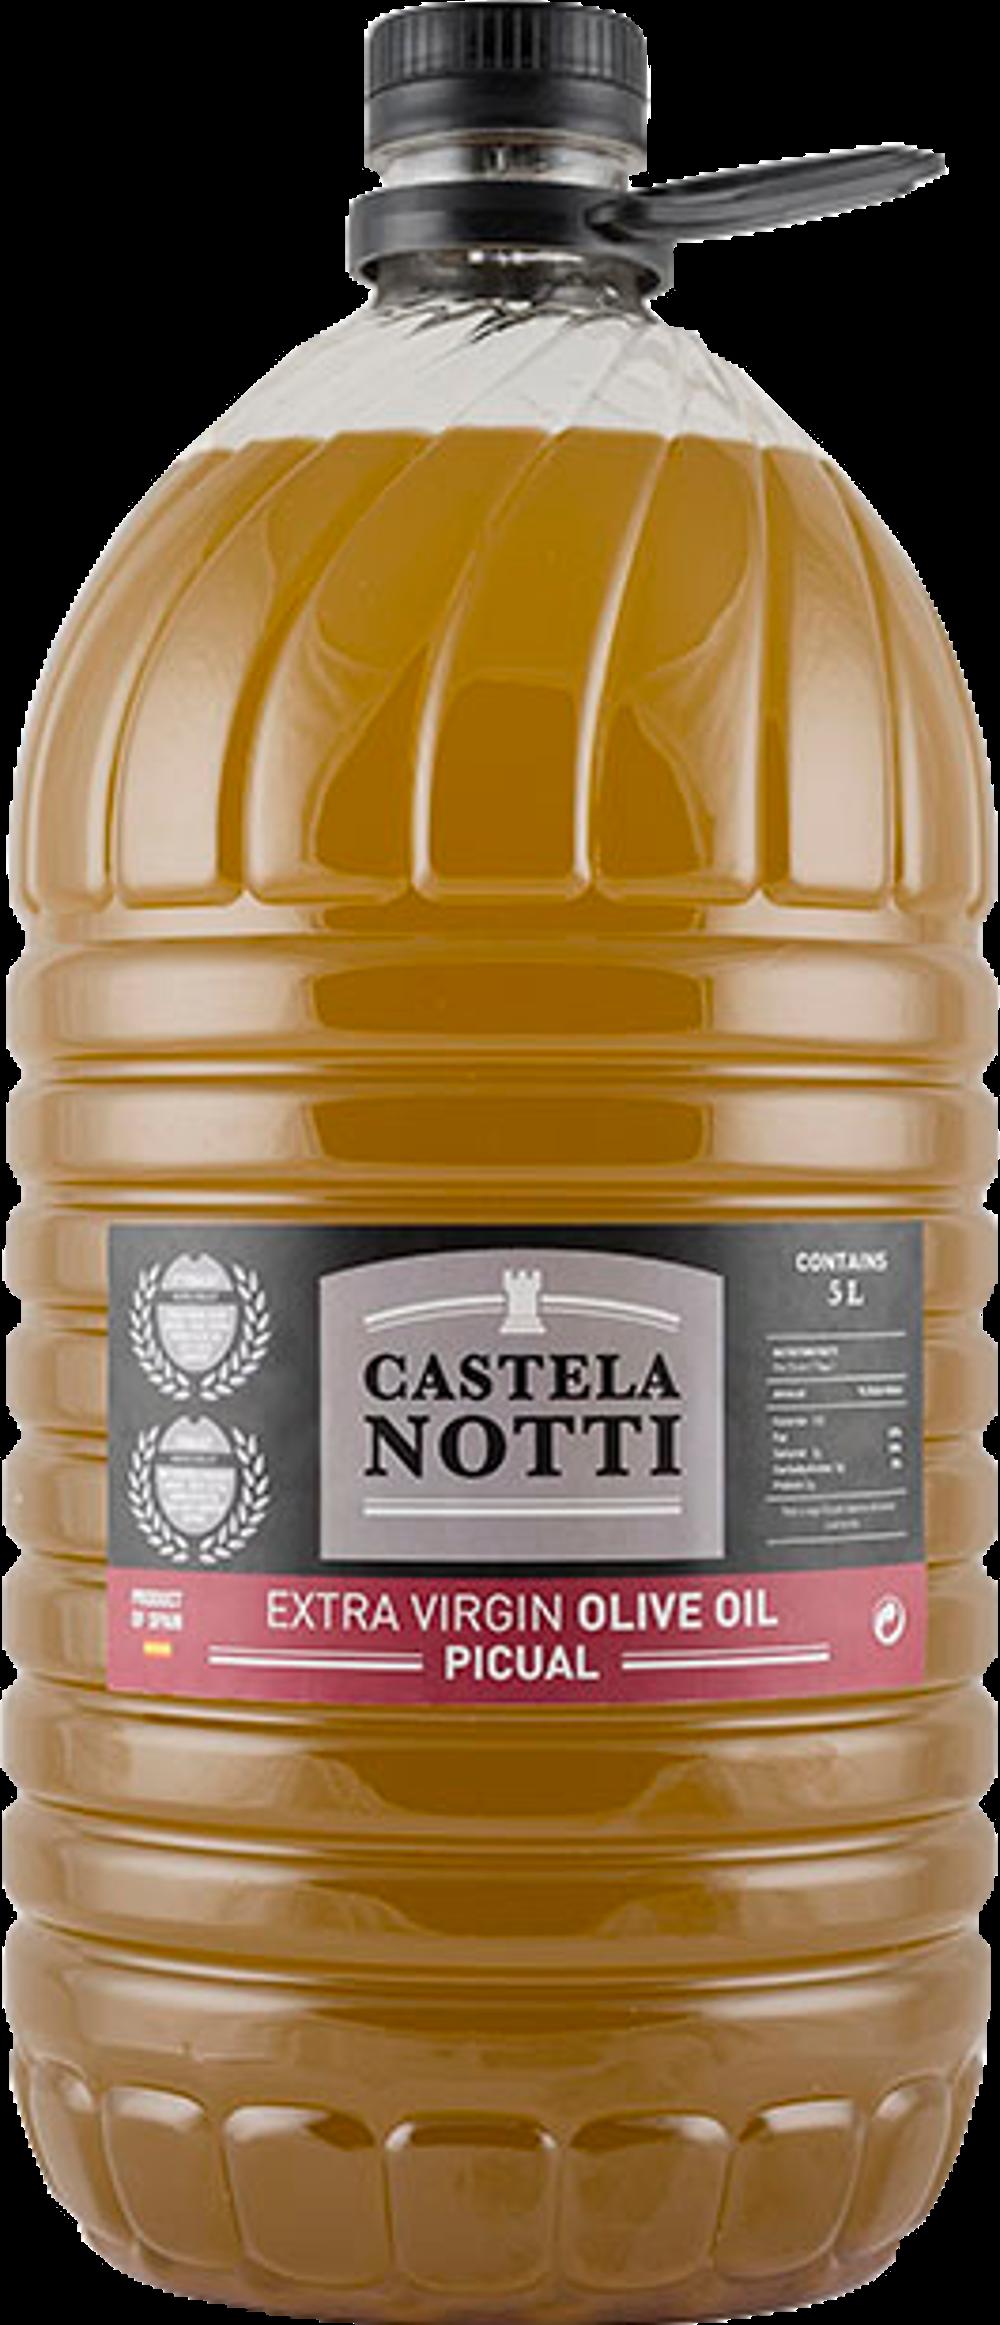 Castelanotti Aceite de Oliva Virgen Extra Picual 5L (PET)